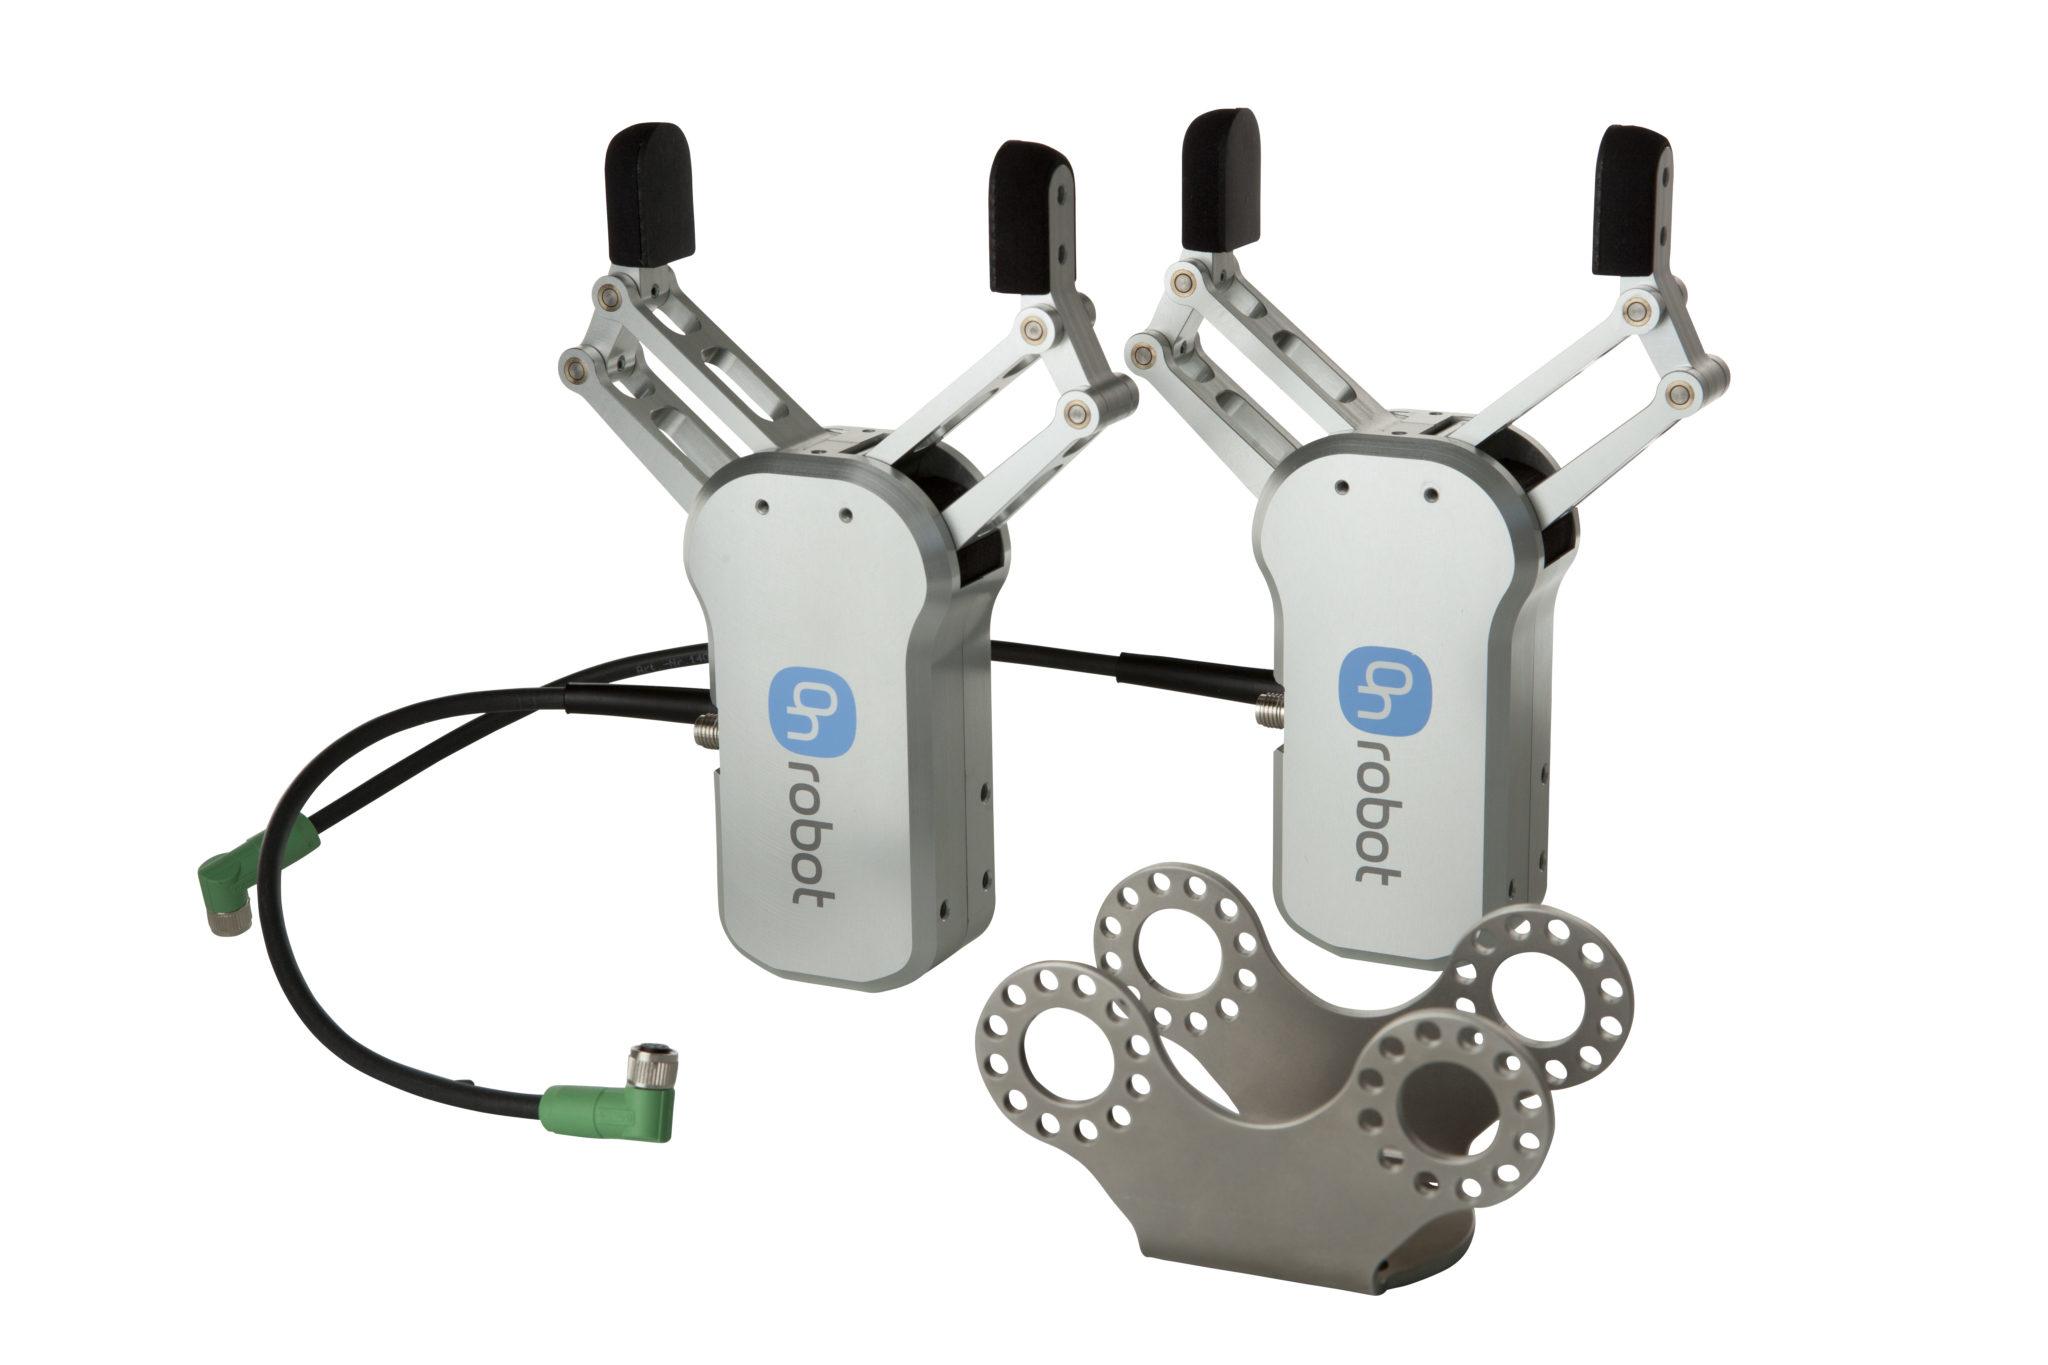 CobotsGuide | OnRobot